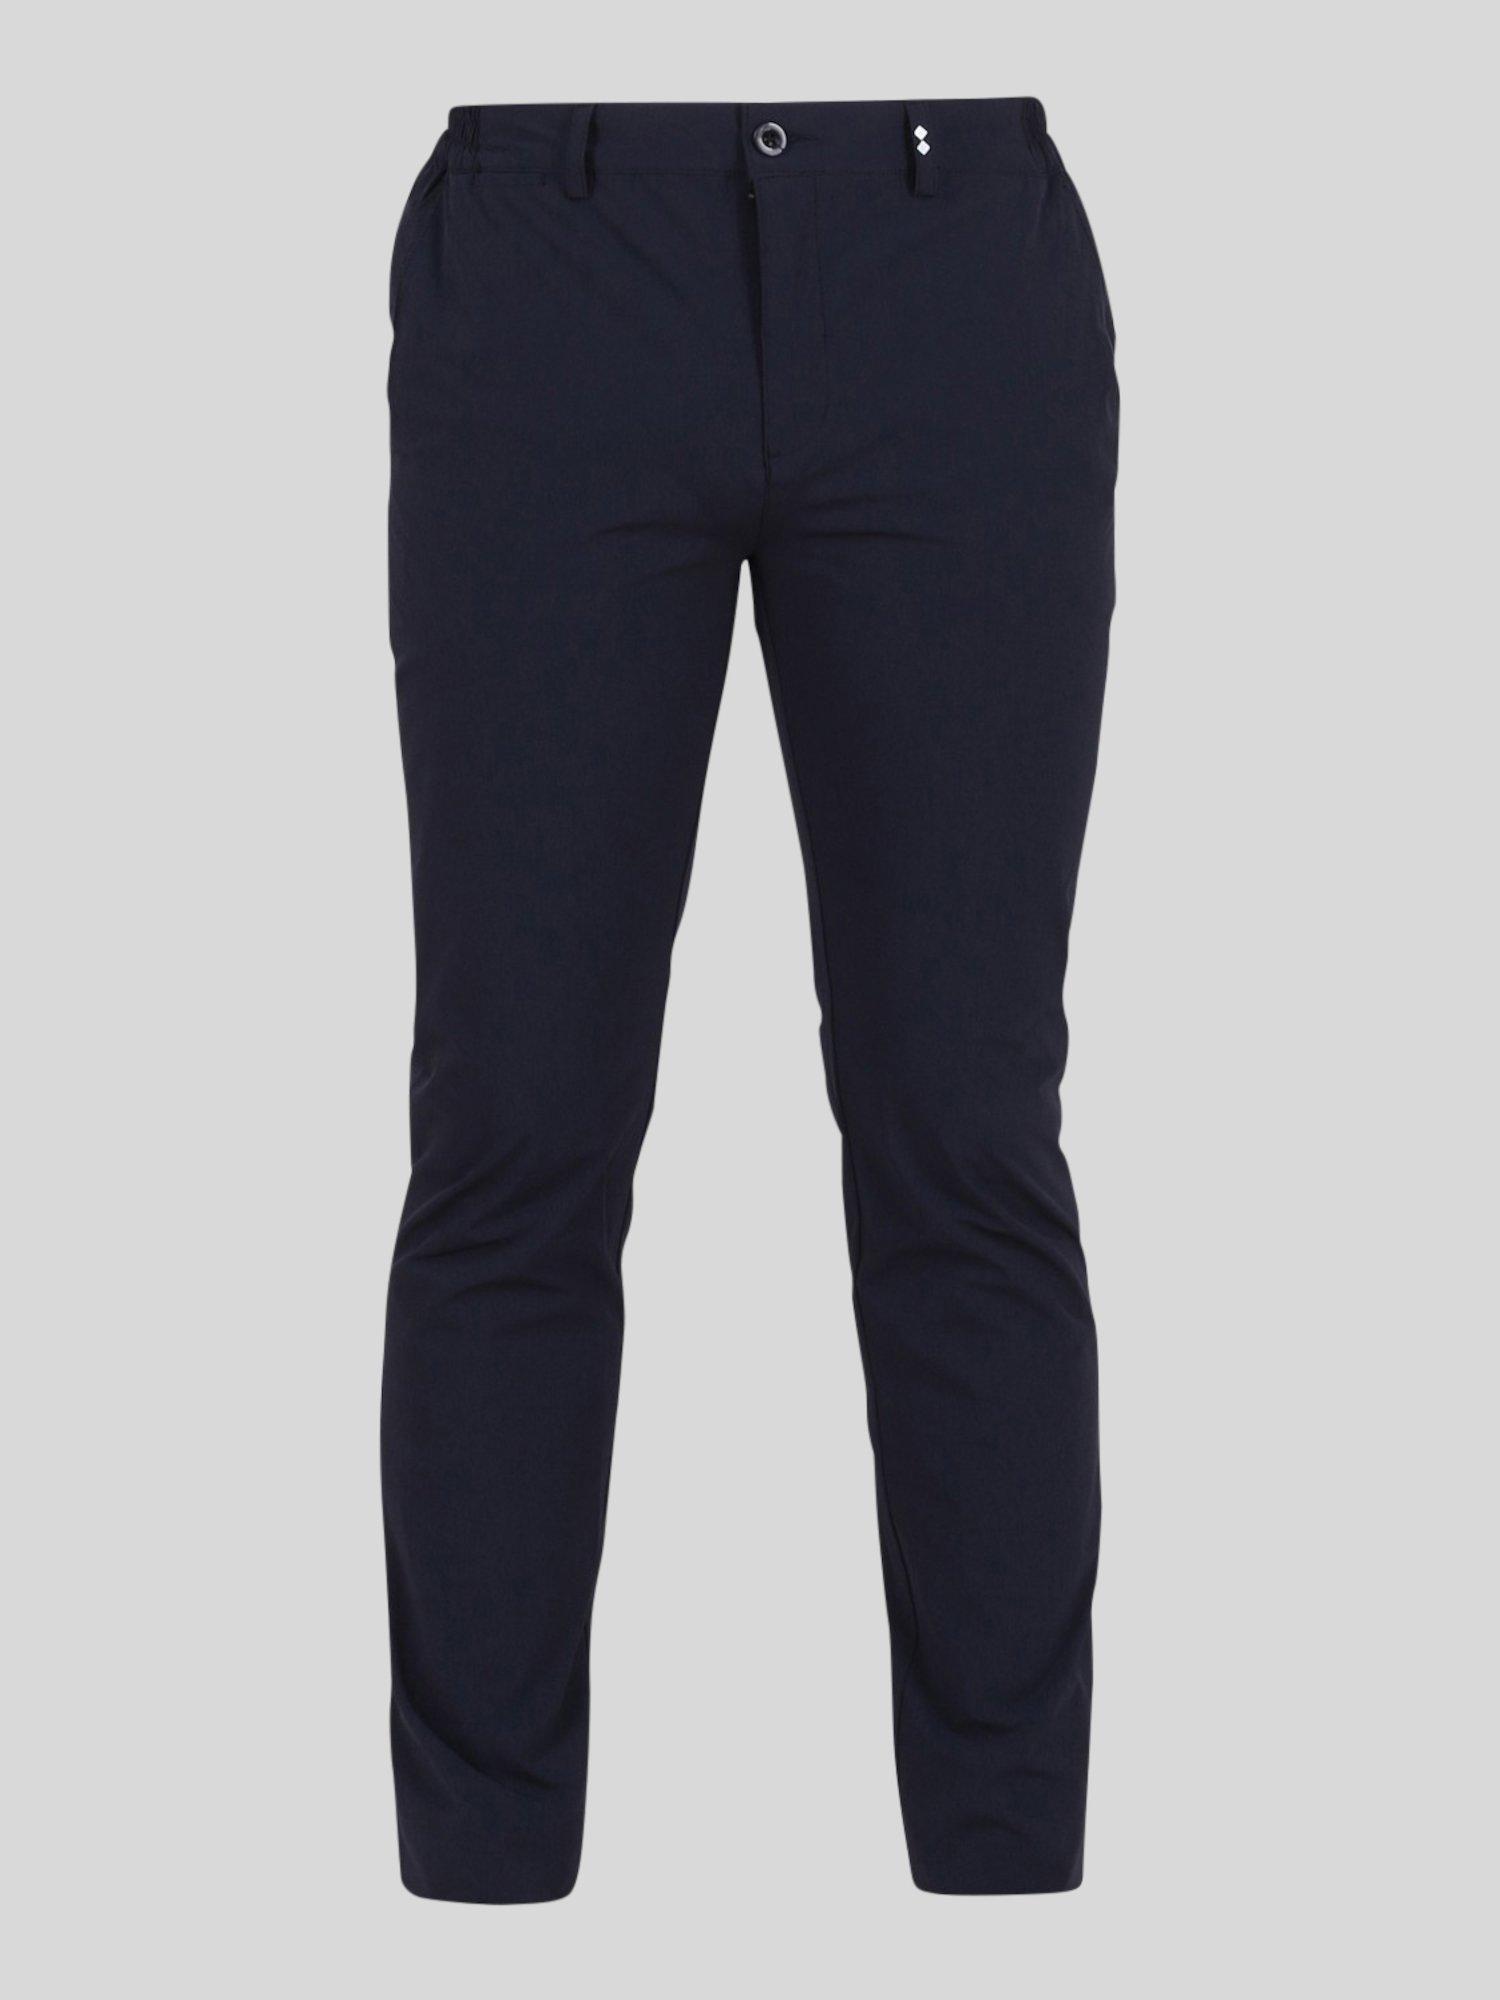 Pantaloni Reef - Blu Oceano